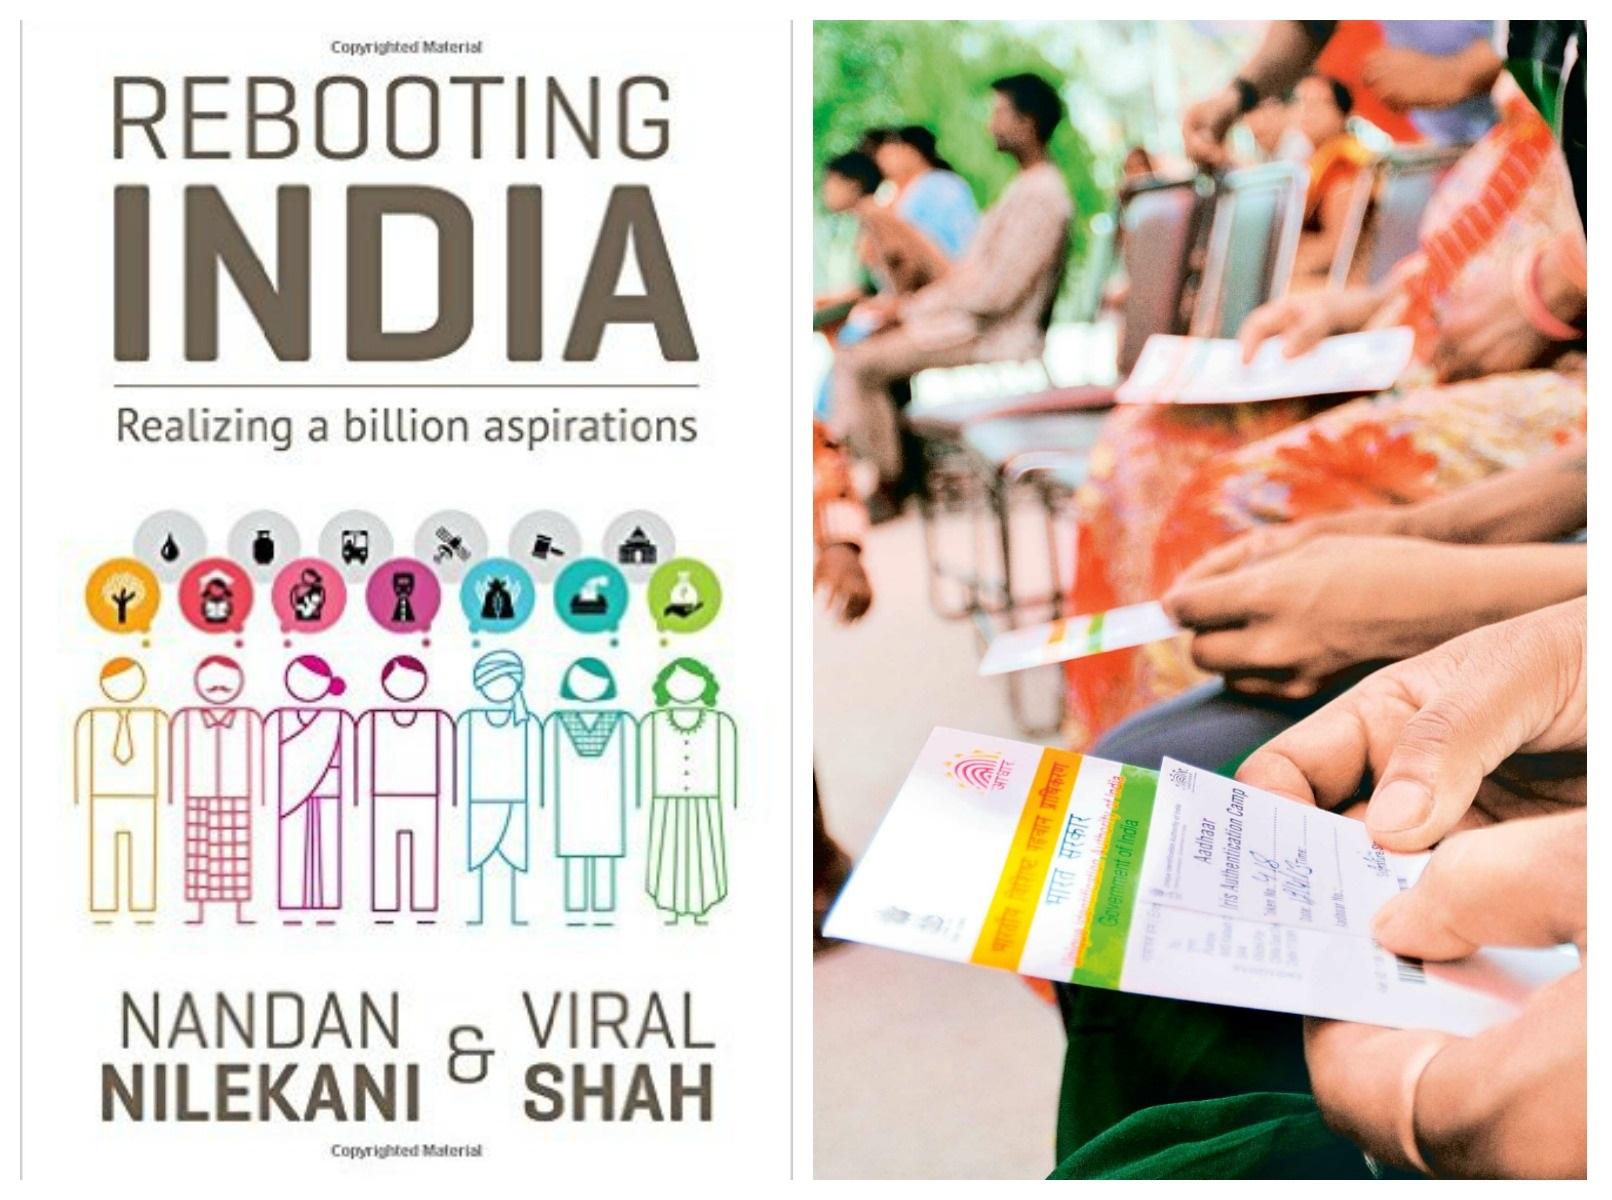 Aadhar card Nandan Nilekani